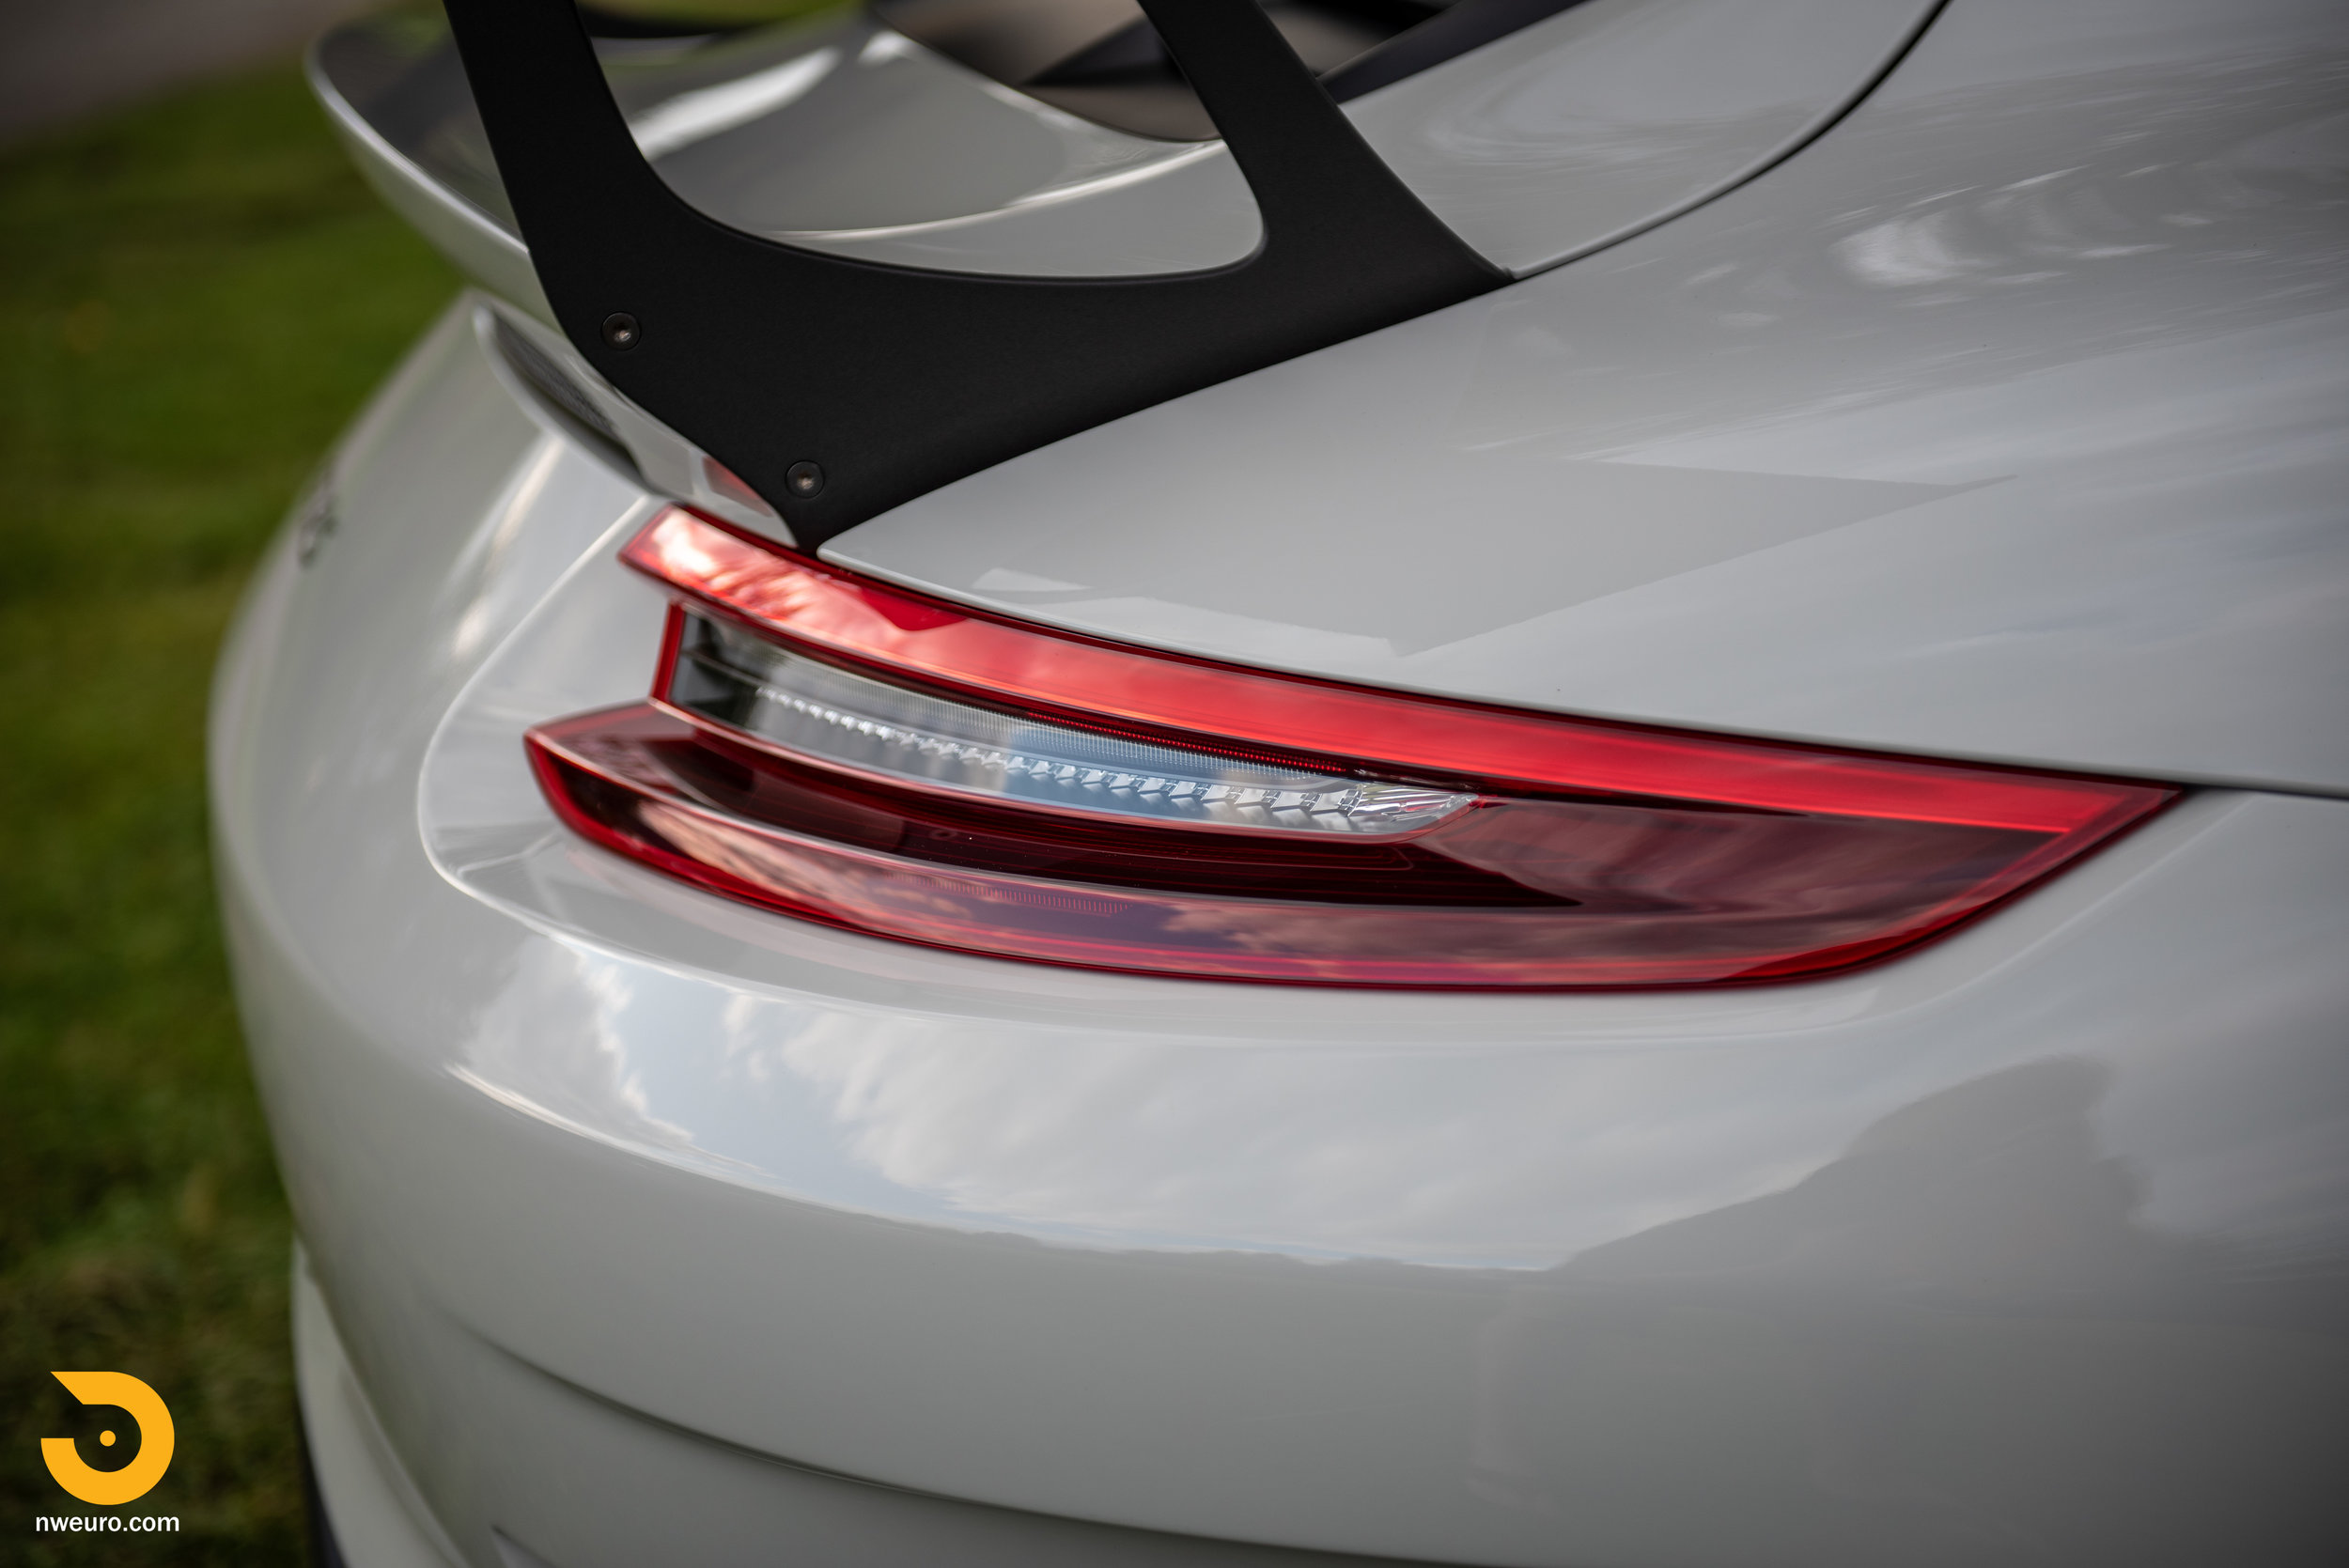 2019 Porsche GT3 RS - Chalk-39.jpg